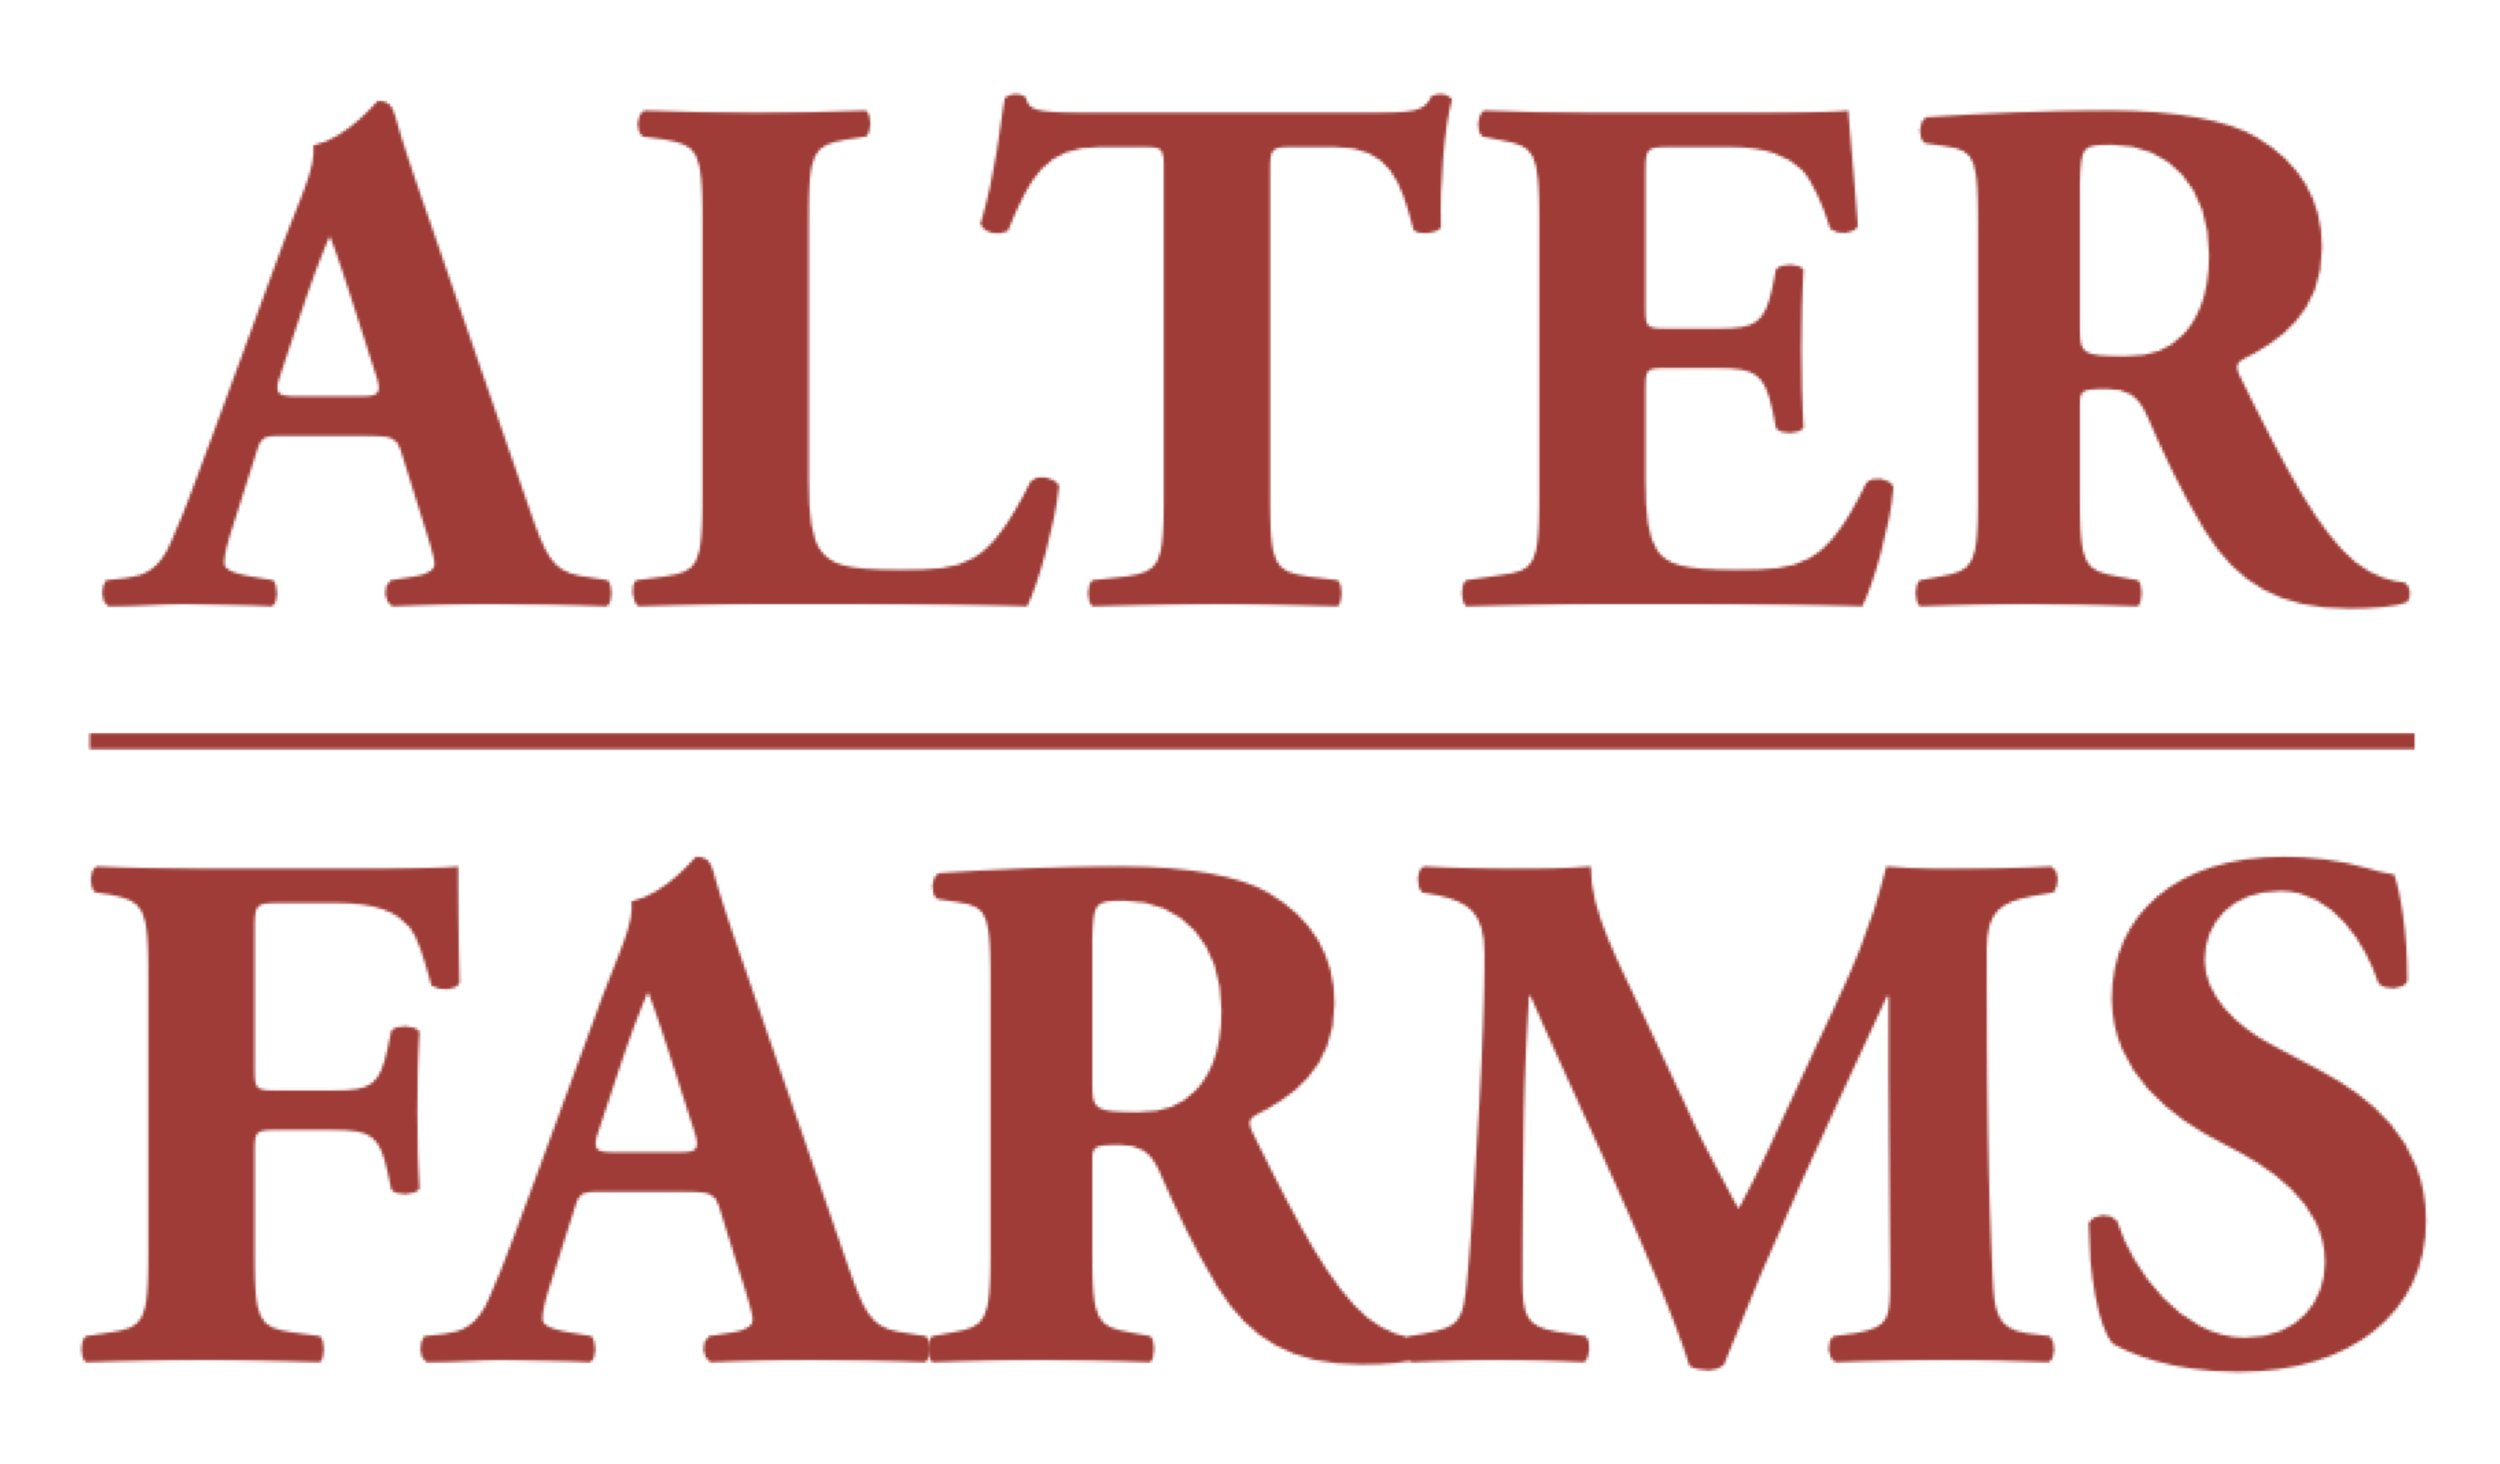 ALTERFARMS-logo.jpg